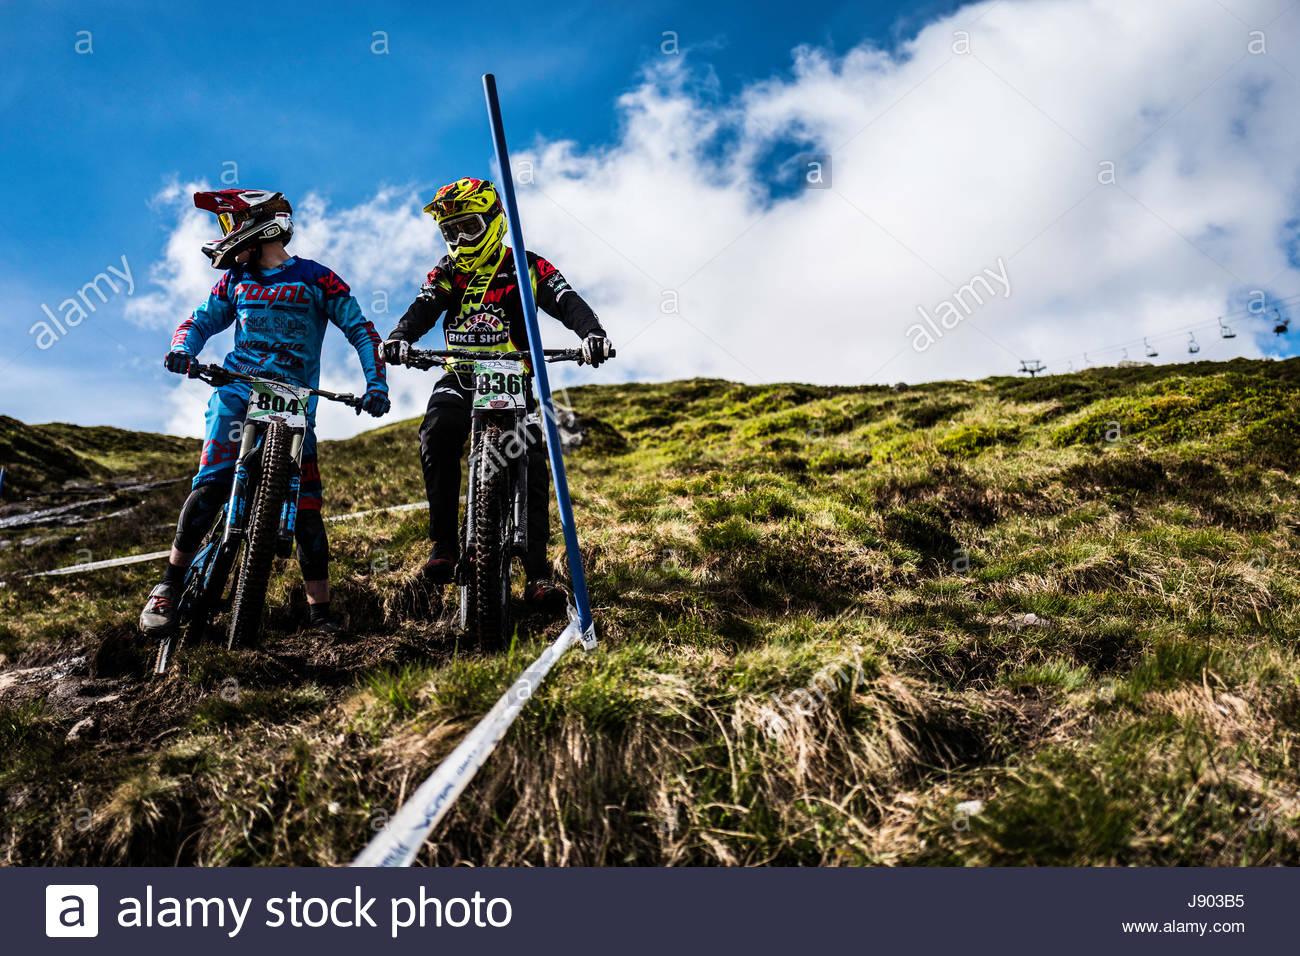 Glencoe, Scottish Highlands, UK. 27/28th May 2017. Downhill mountain bikers competing in the Scottish Downhill Association Stock Photo